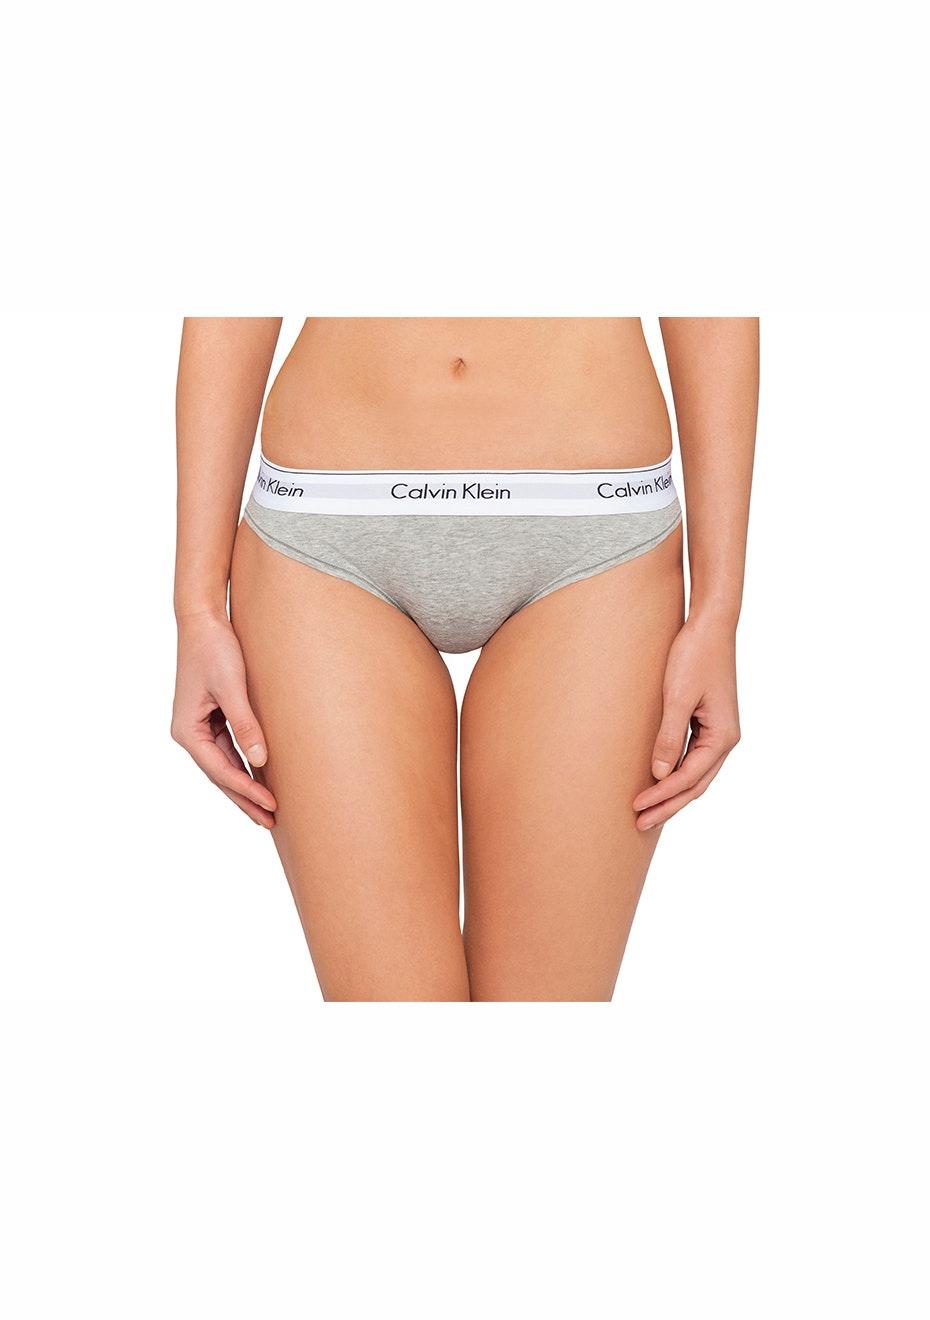 Calvin Klein - Modern Cotton Bikini - Grey  Heather